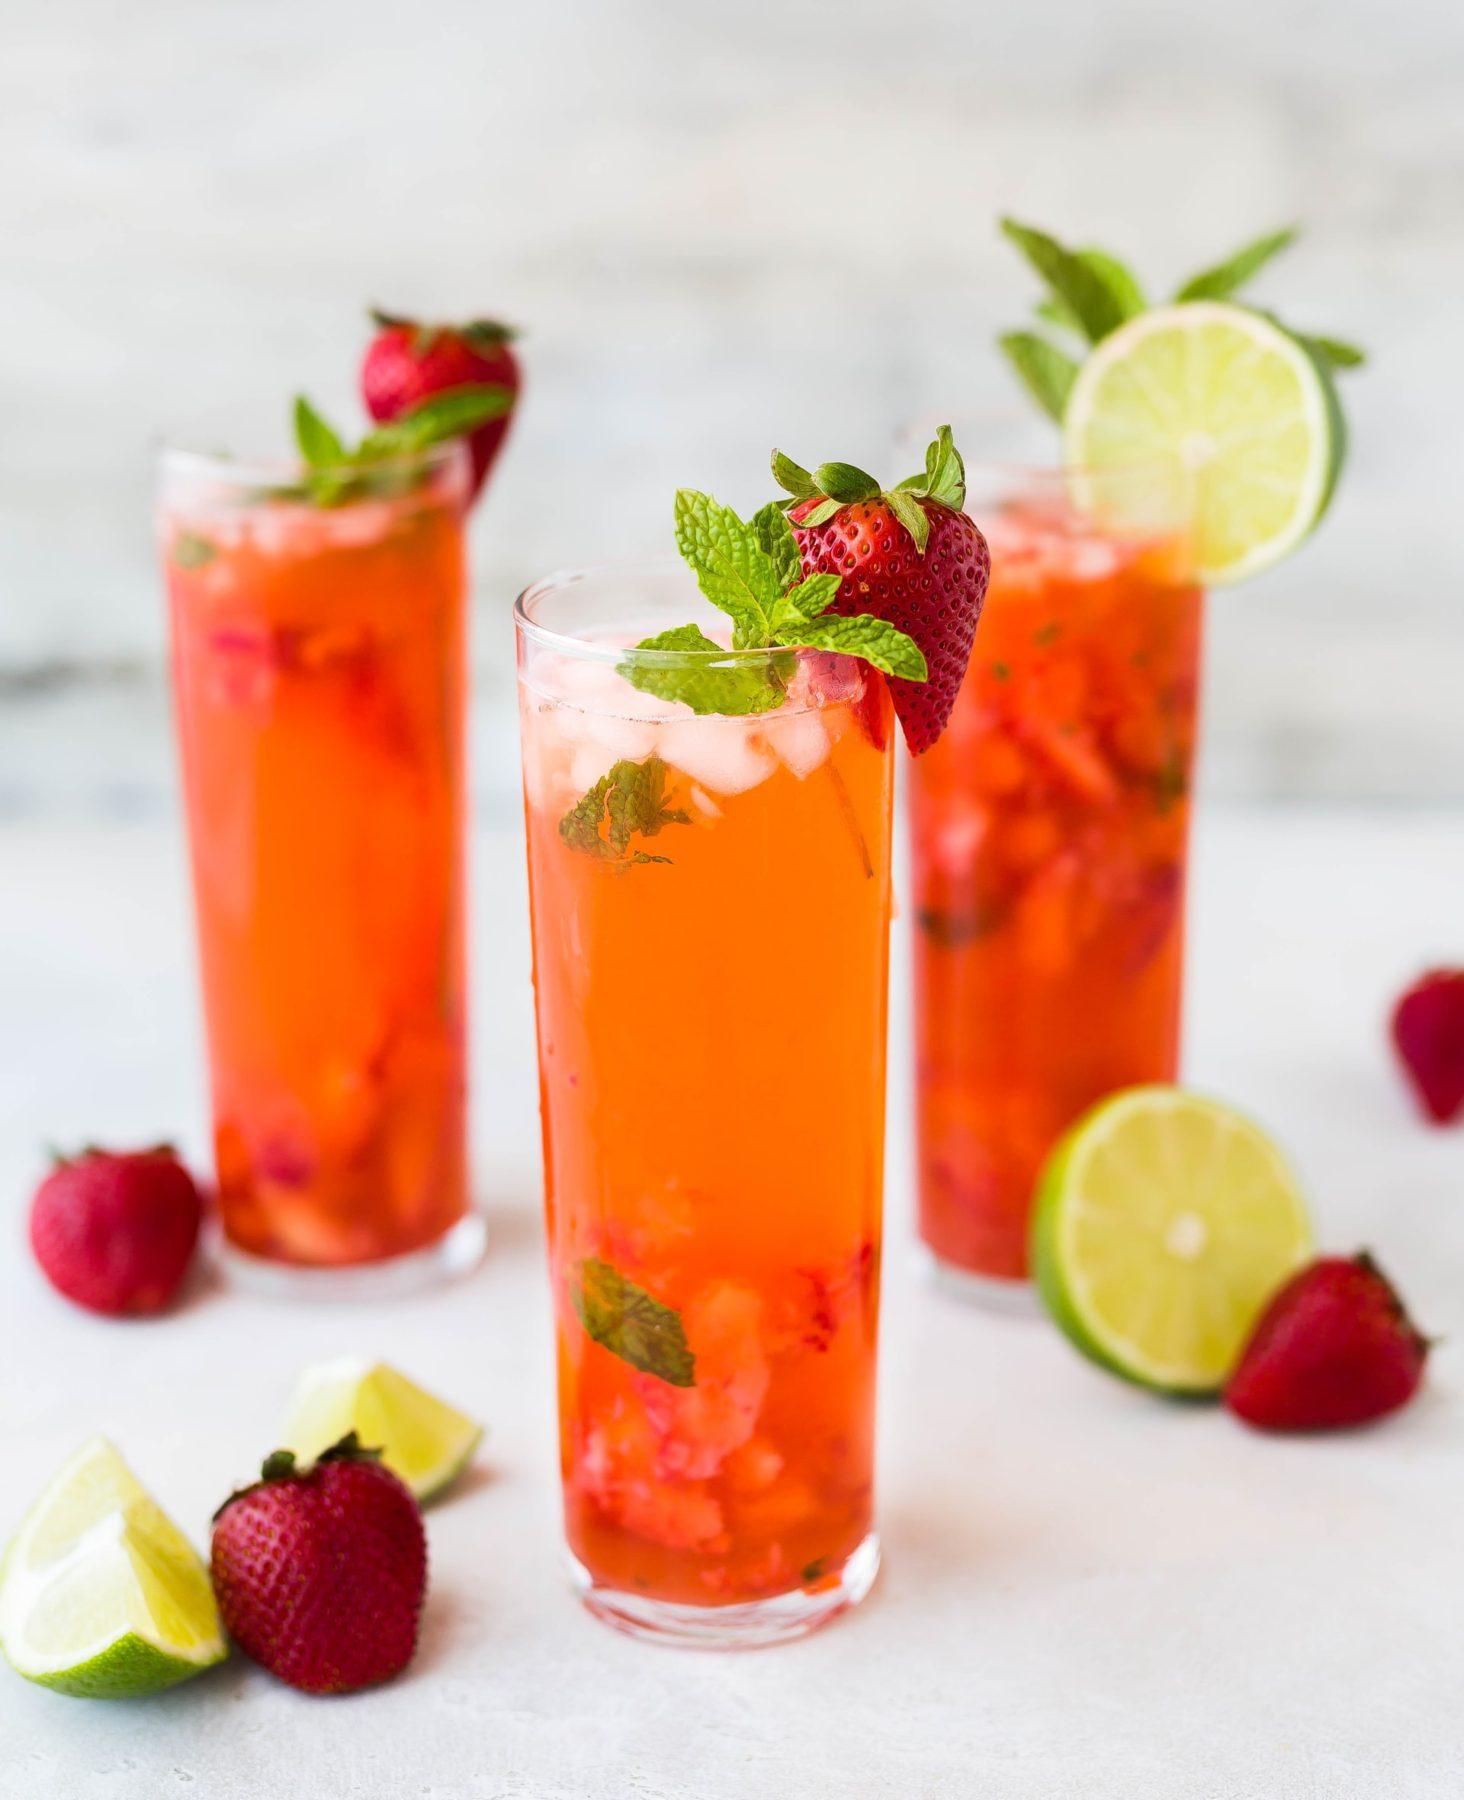 starbucks secret menu copycat recipe strawberry lemonade